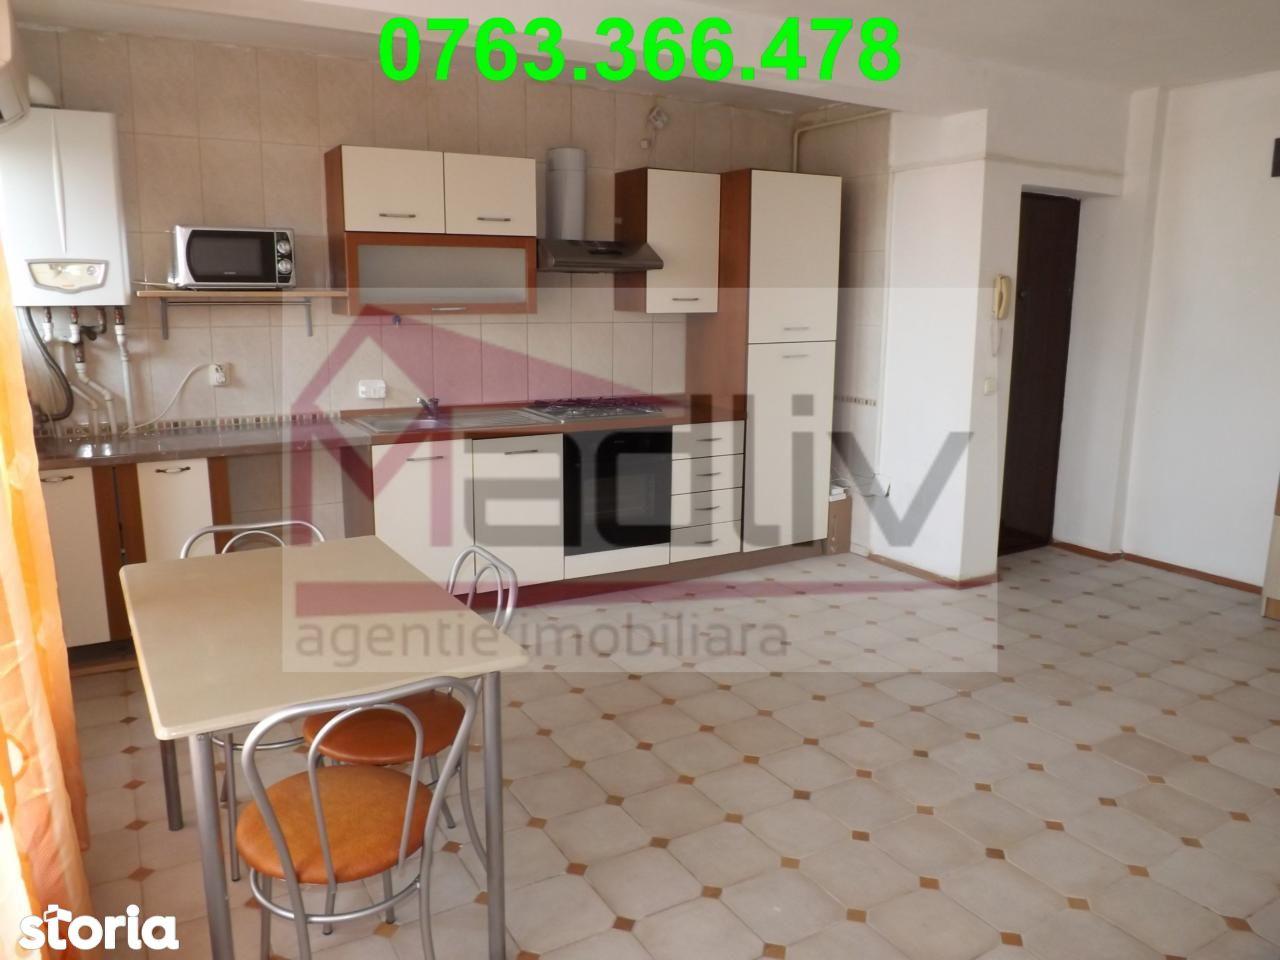 Apartament de inchiriat, Dolj (judet), Craiovița Veche - Foto 2